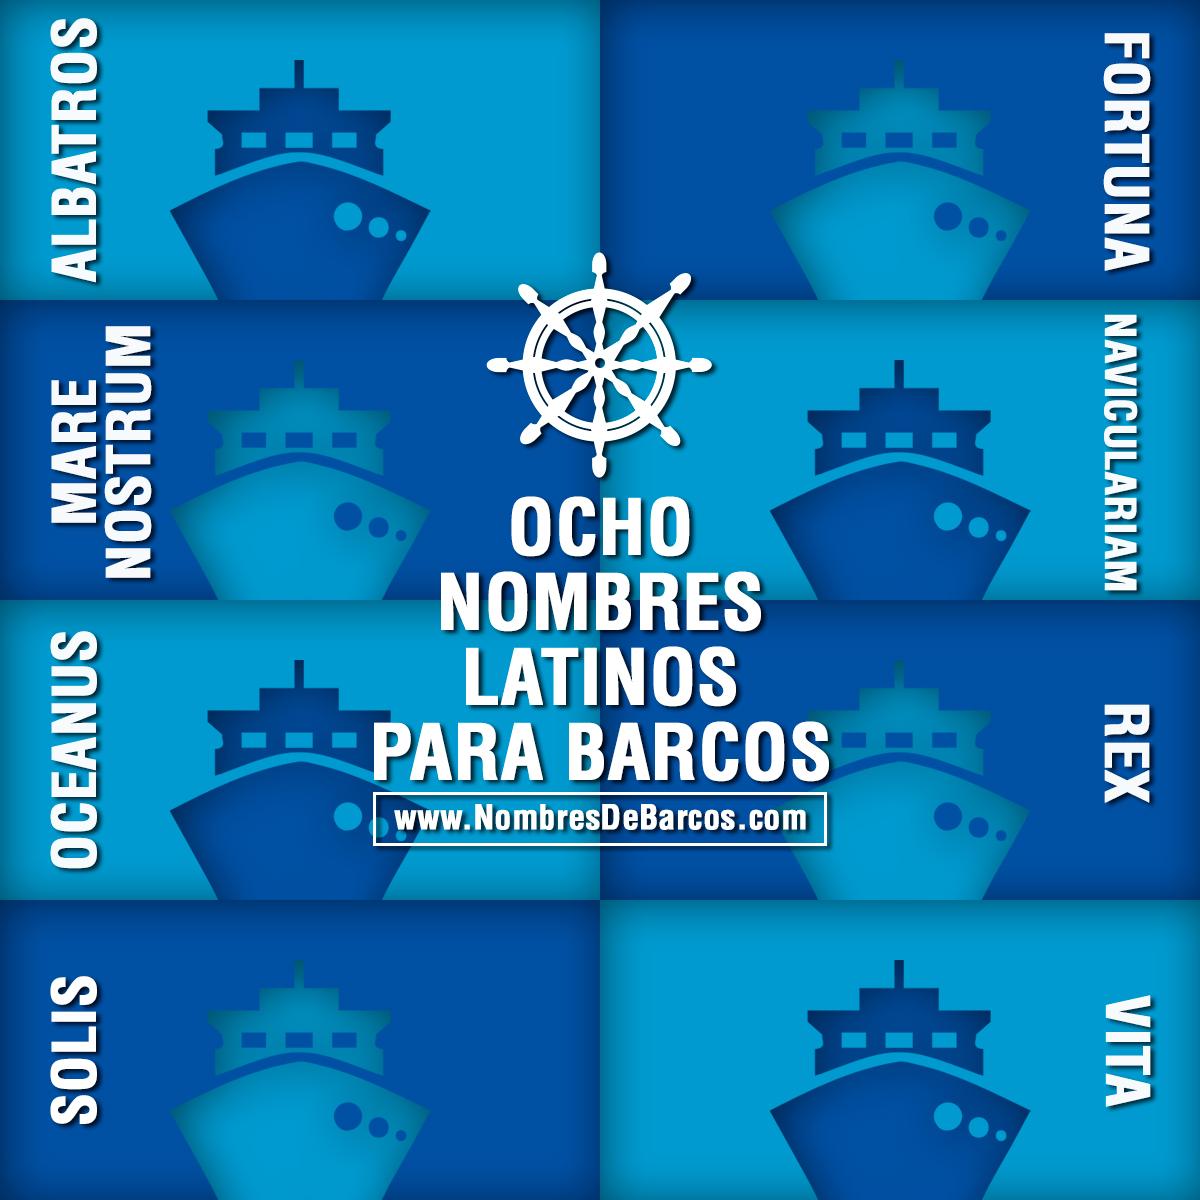 8-NOMBRES-LATINOS-PARA-BARCOS